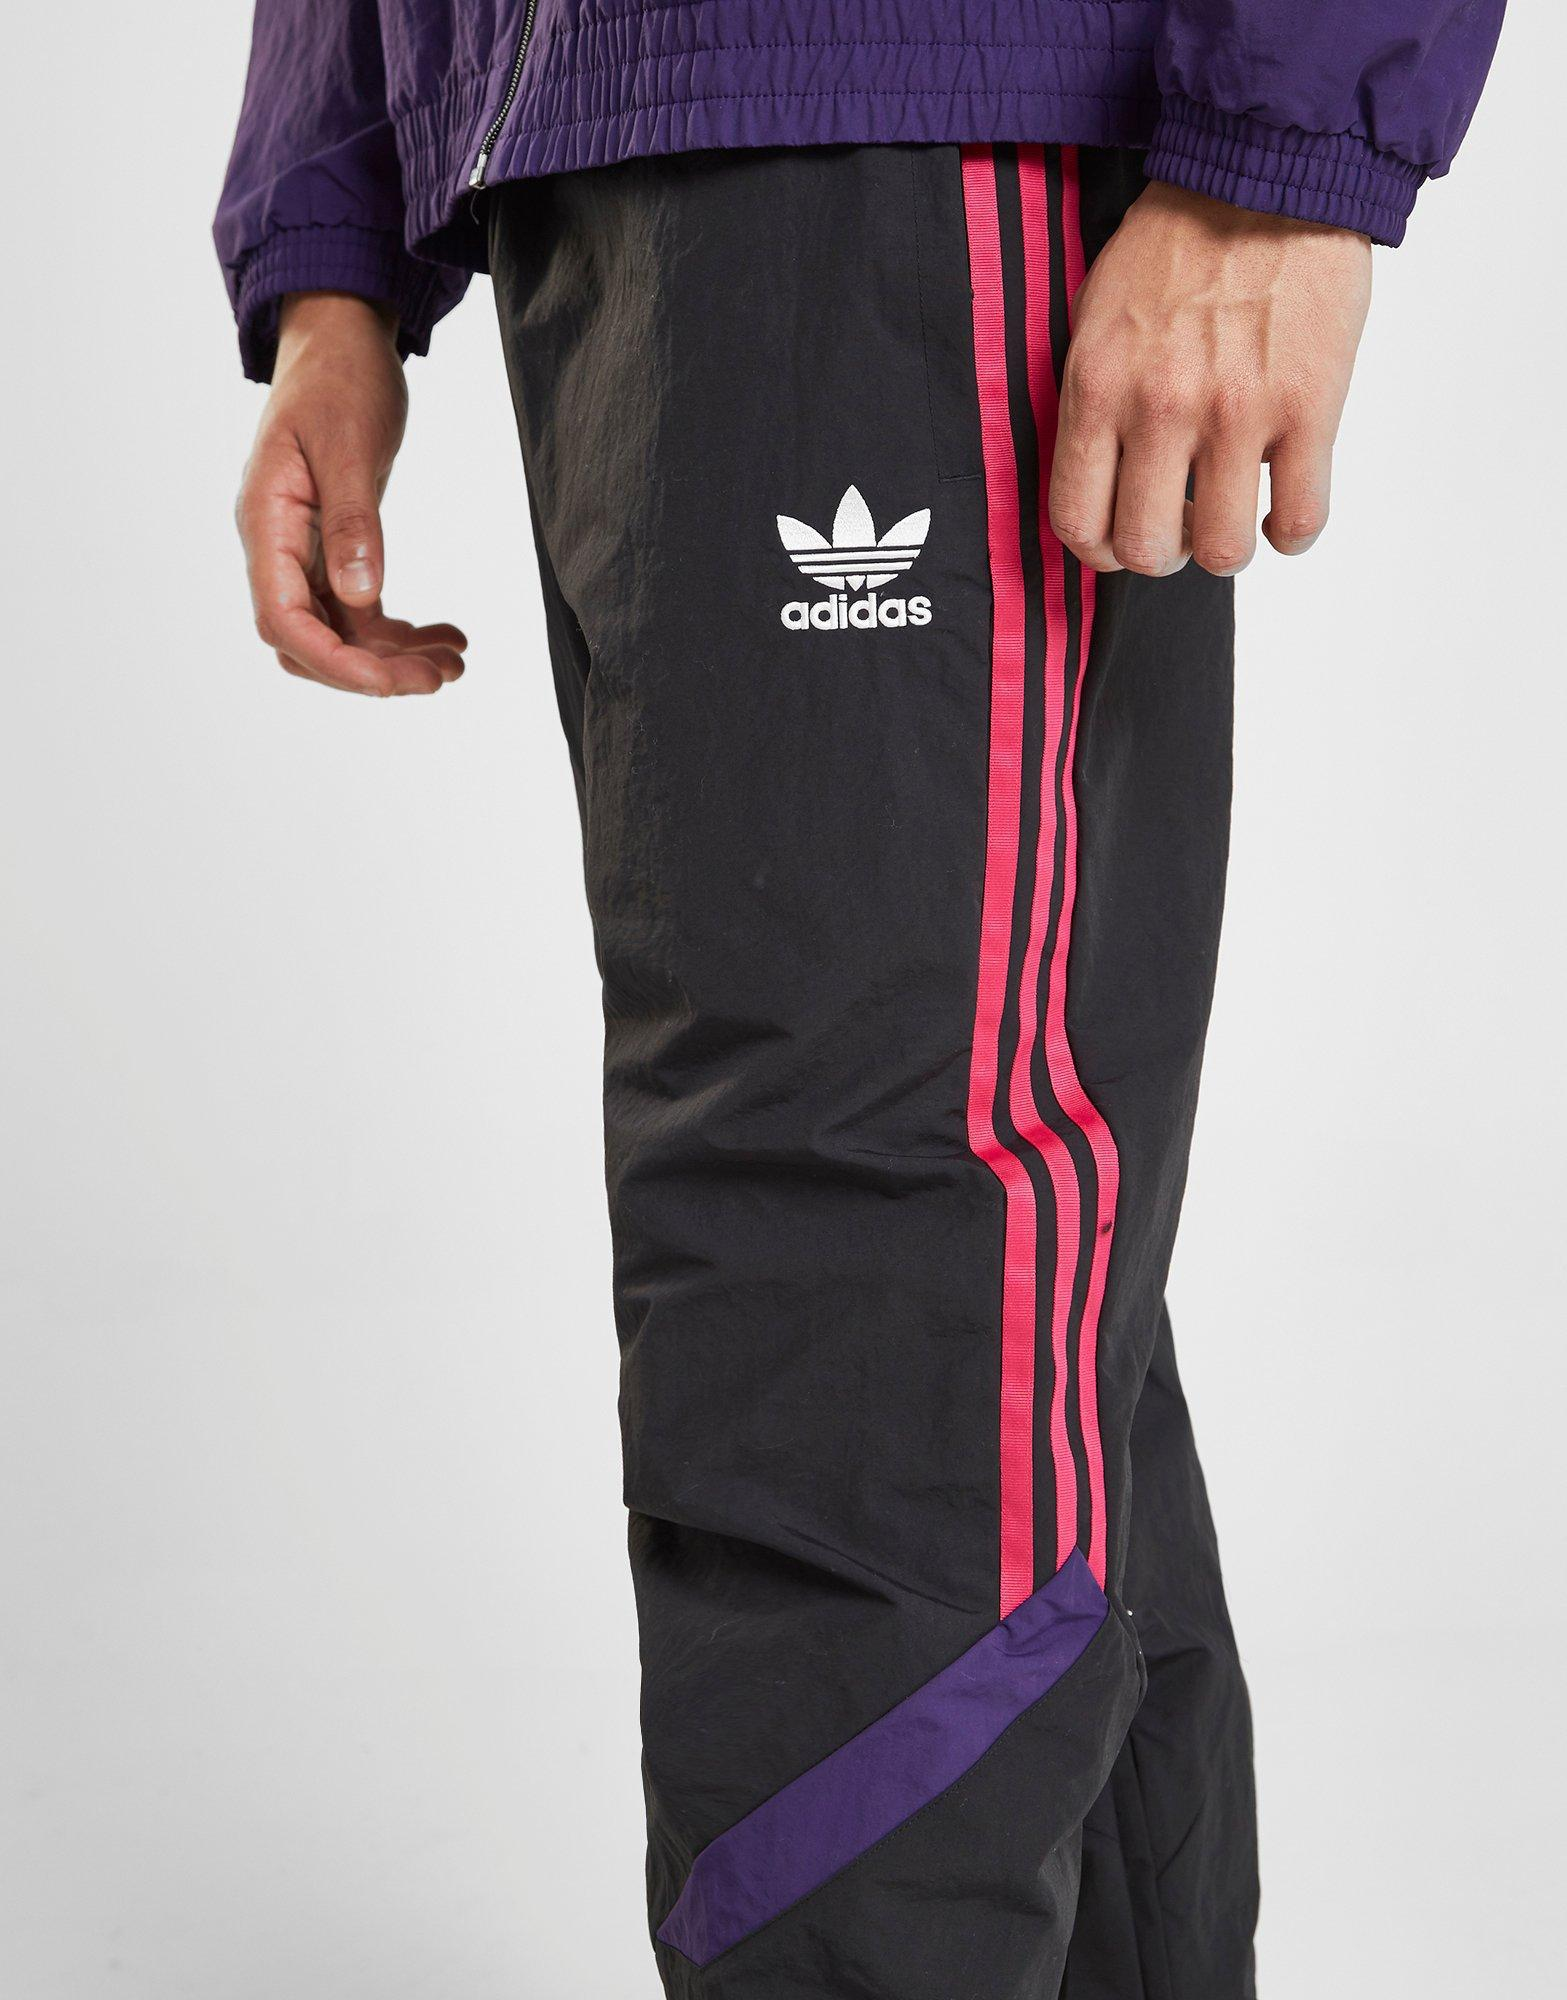 ed4eb38f7 adidas Originals Sportivo Track Pants in Black for Men - Lyst